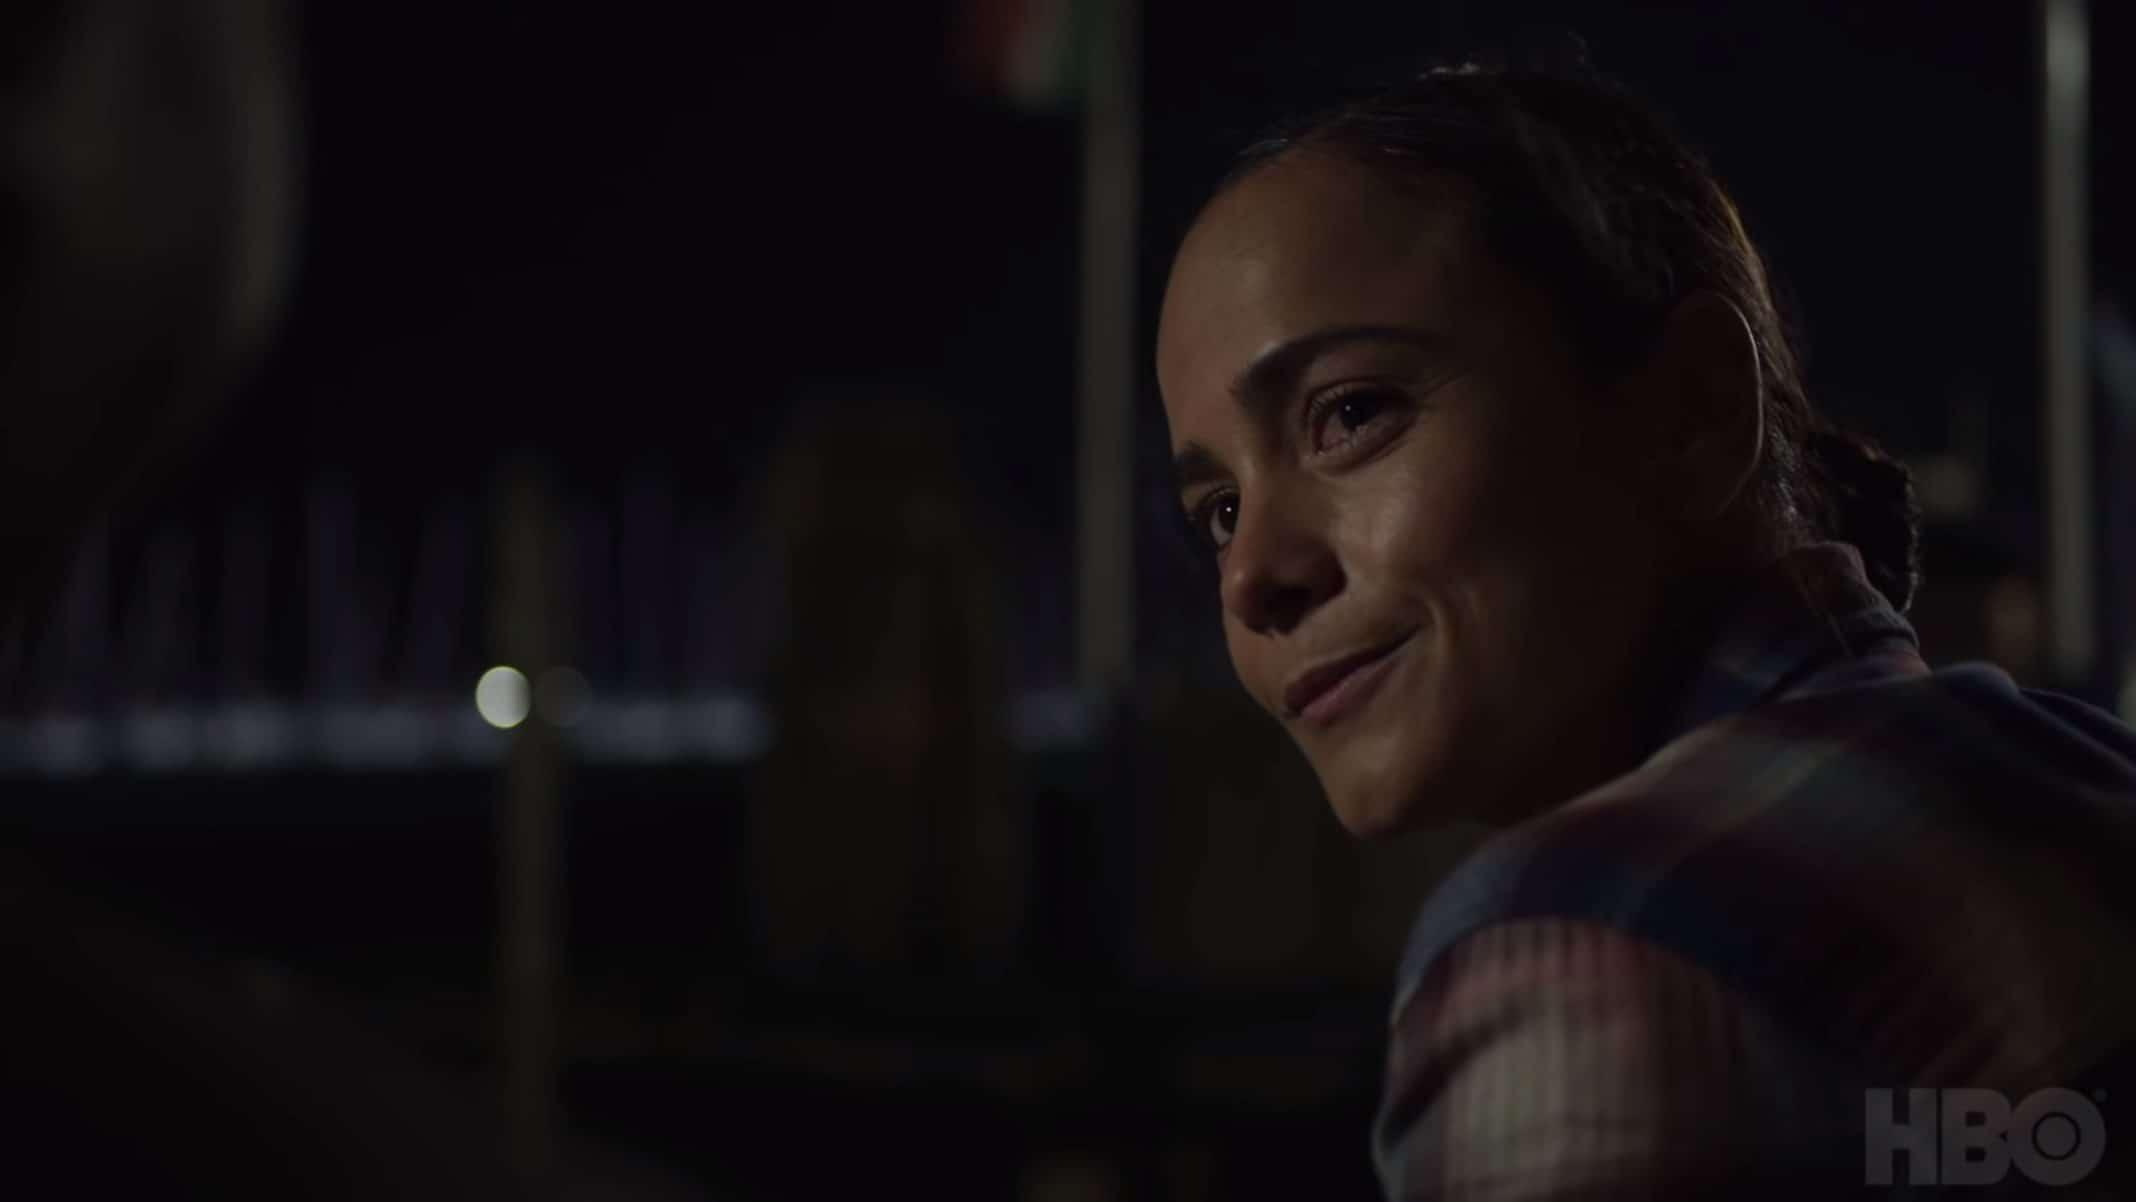 Maggie Wilson (Alice Braga) having a late night conversation